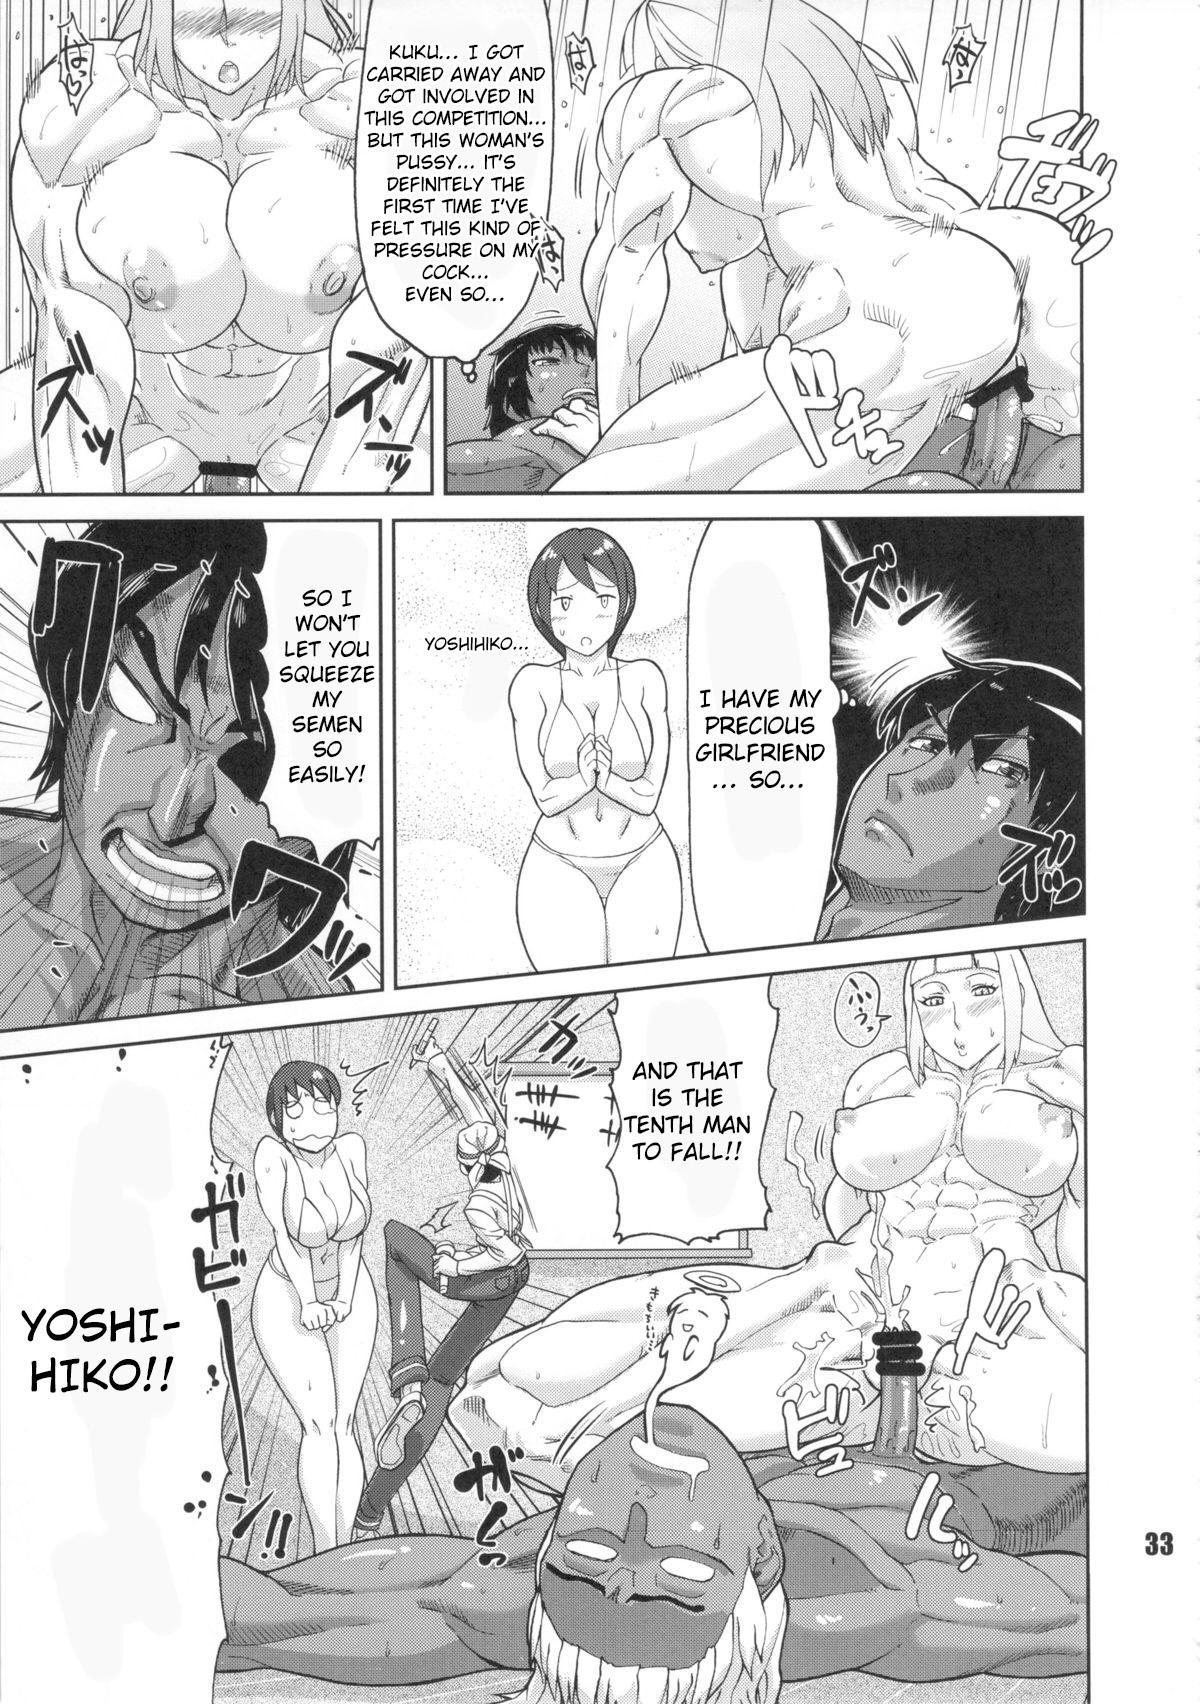 Magic Muscle Girl Six Pack / Jackasss (nWa 7th in Light Heavyweight) ENG (NEO-QUEENDOM Vol. 8) [Raknnkarscans] 4